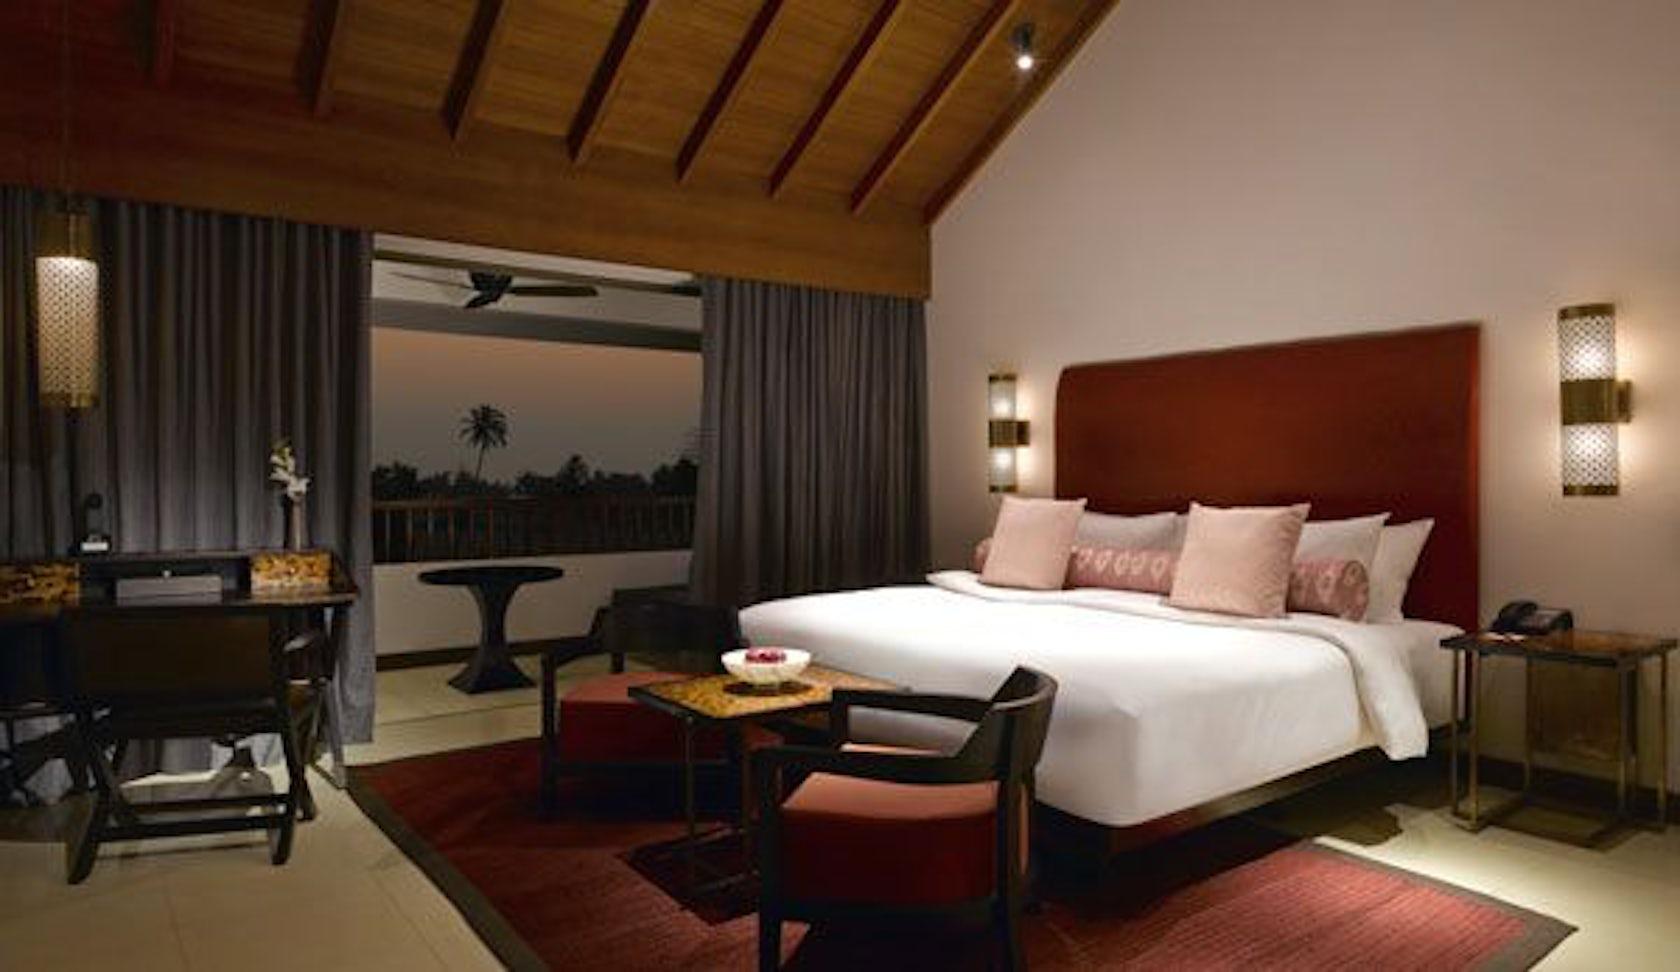 Alila Diwa Rooms Architizer